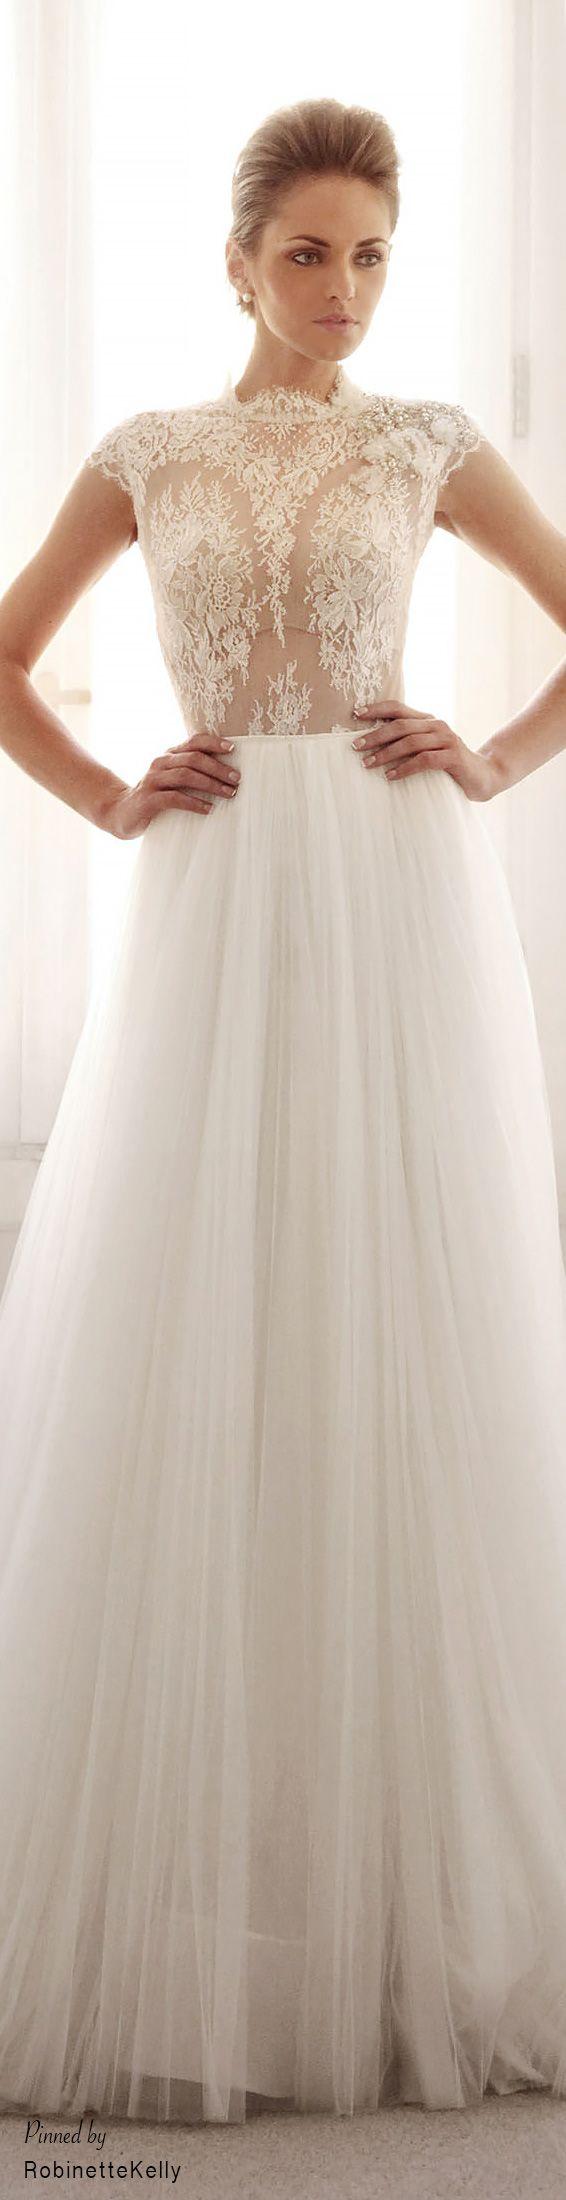 Wedding dresses boho wedding dresses pinterest wedding dress